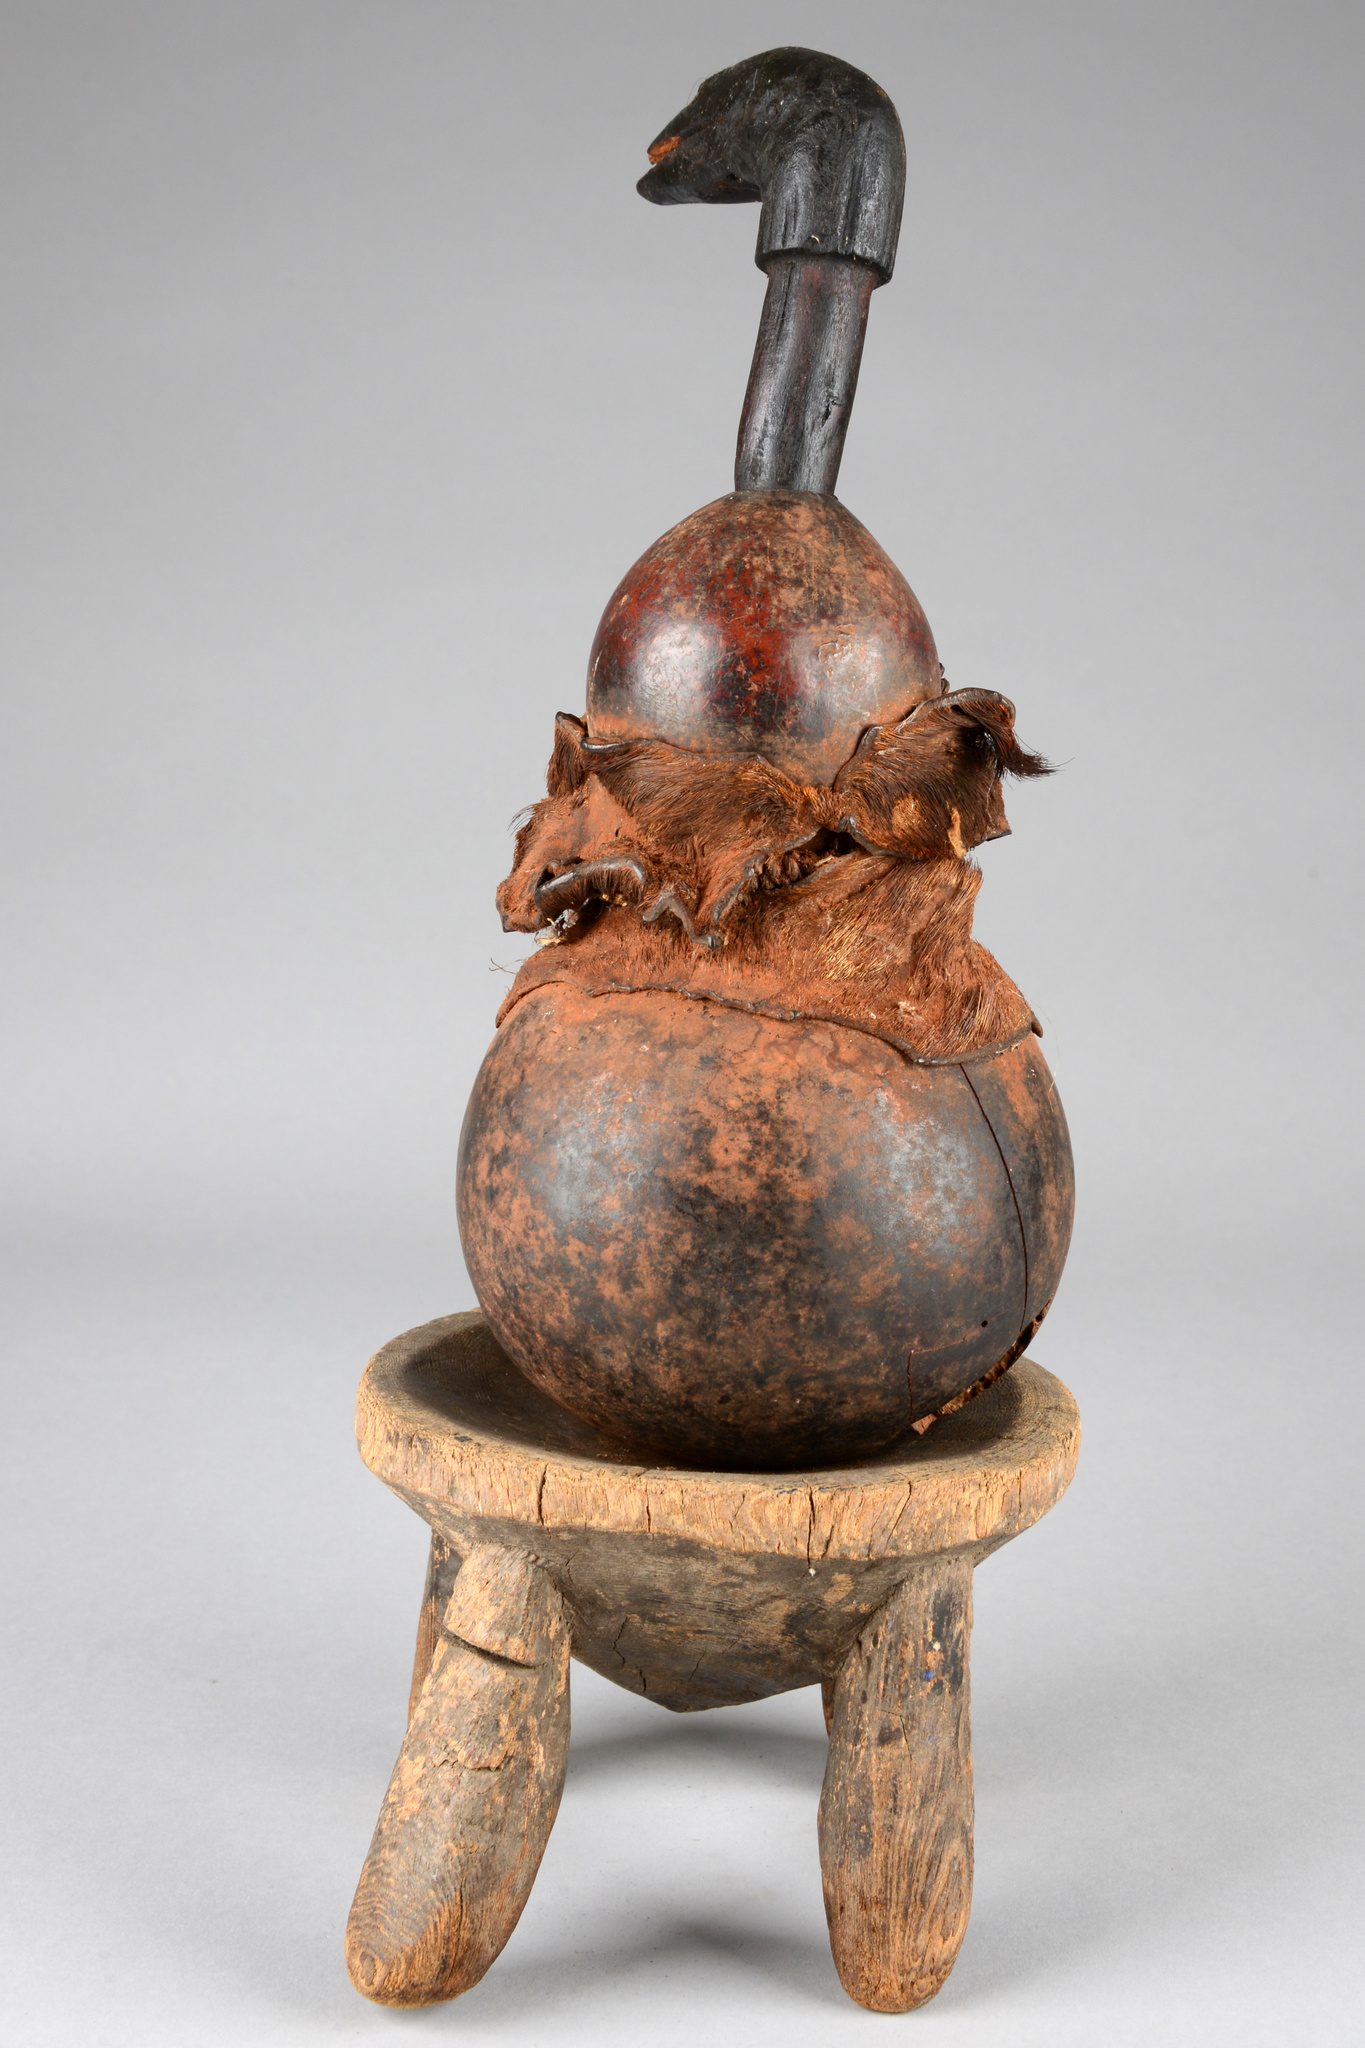 Calabash with stool